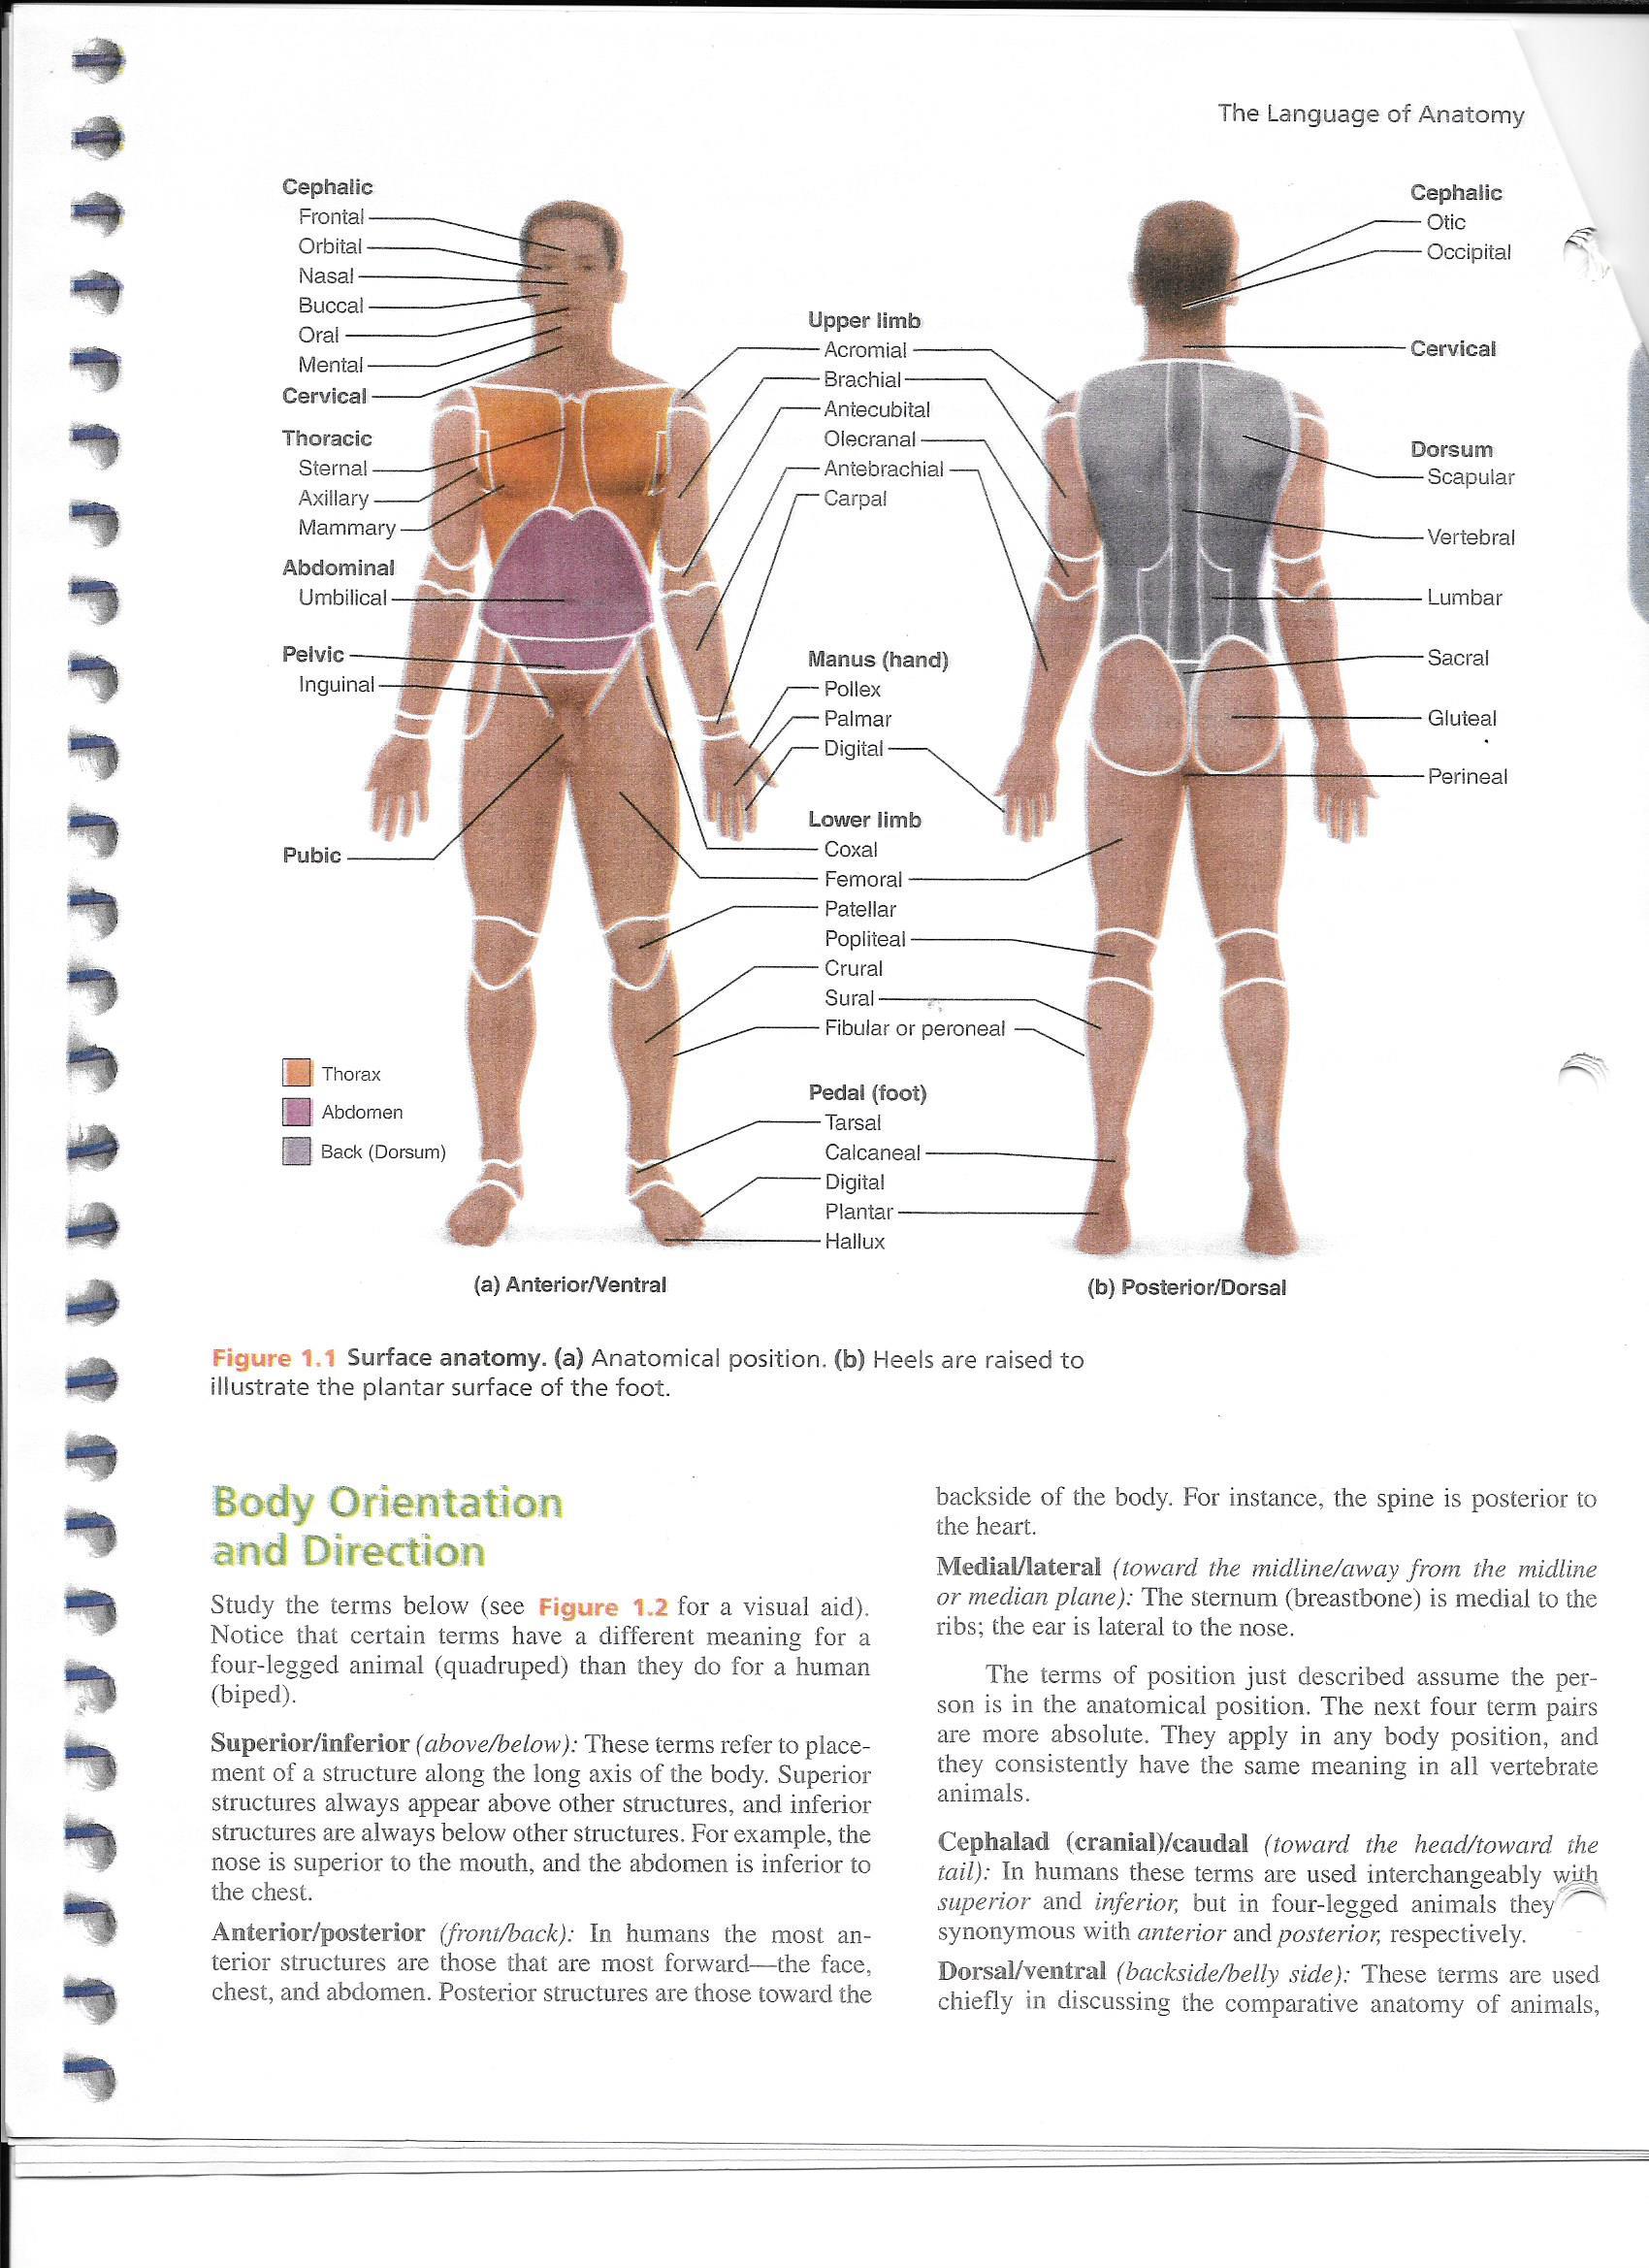 Imagequiz Surface Anatomy